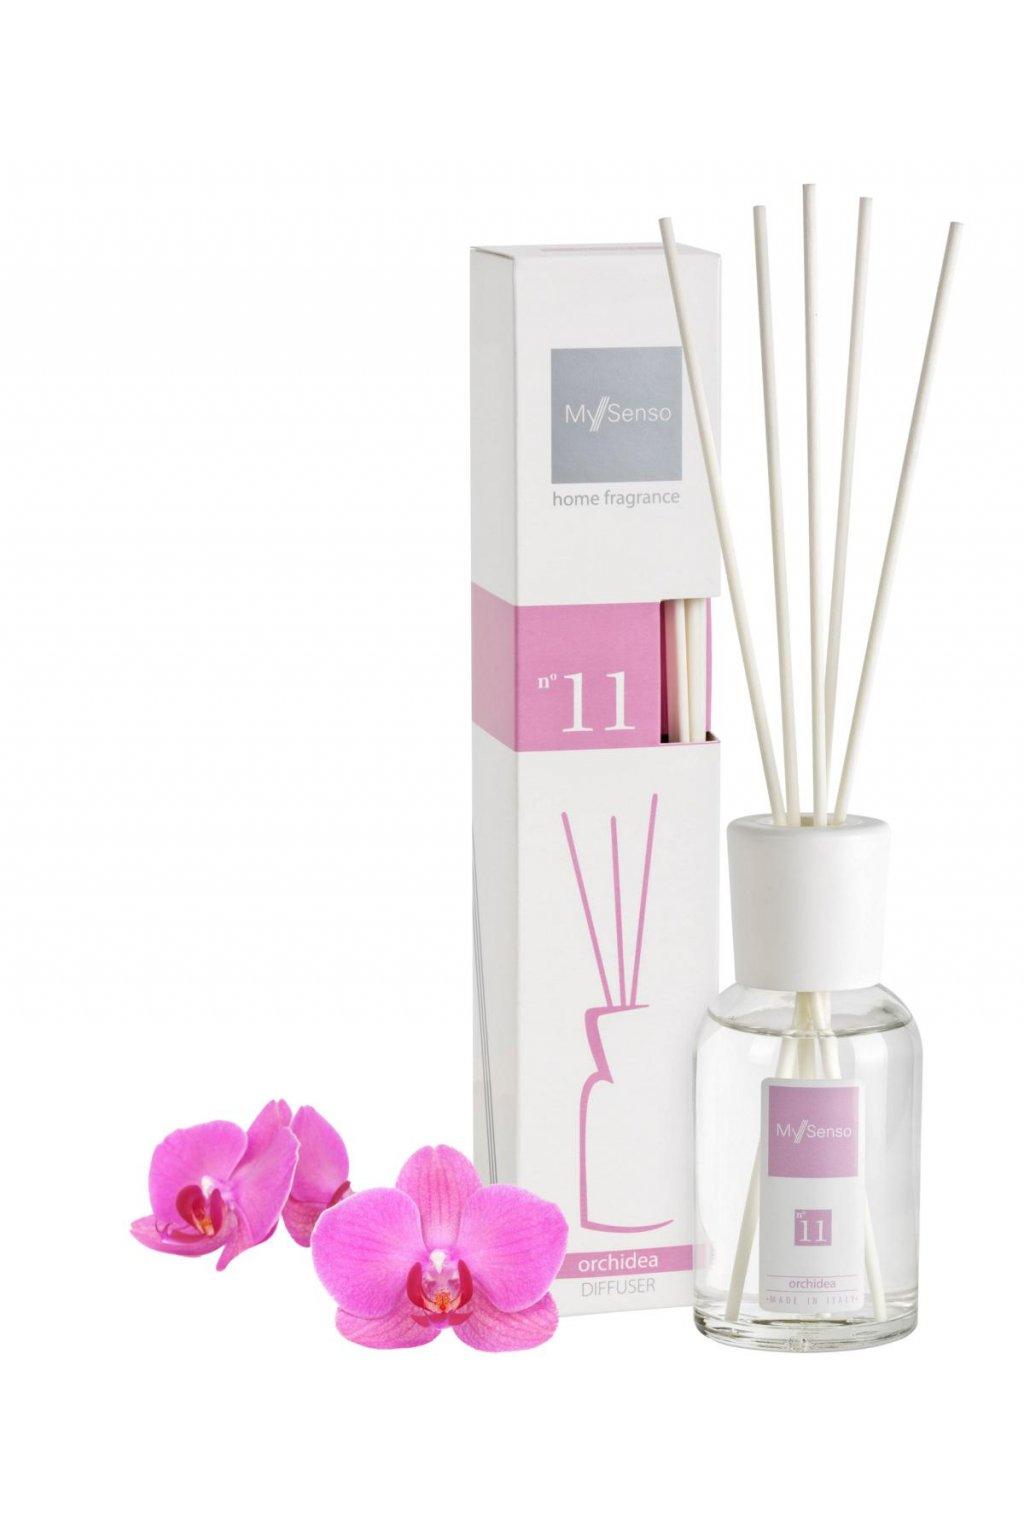 84 my senso aromaticky difuzer midi 100ml n 11 orchidea orchidej